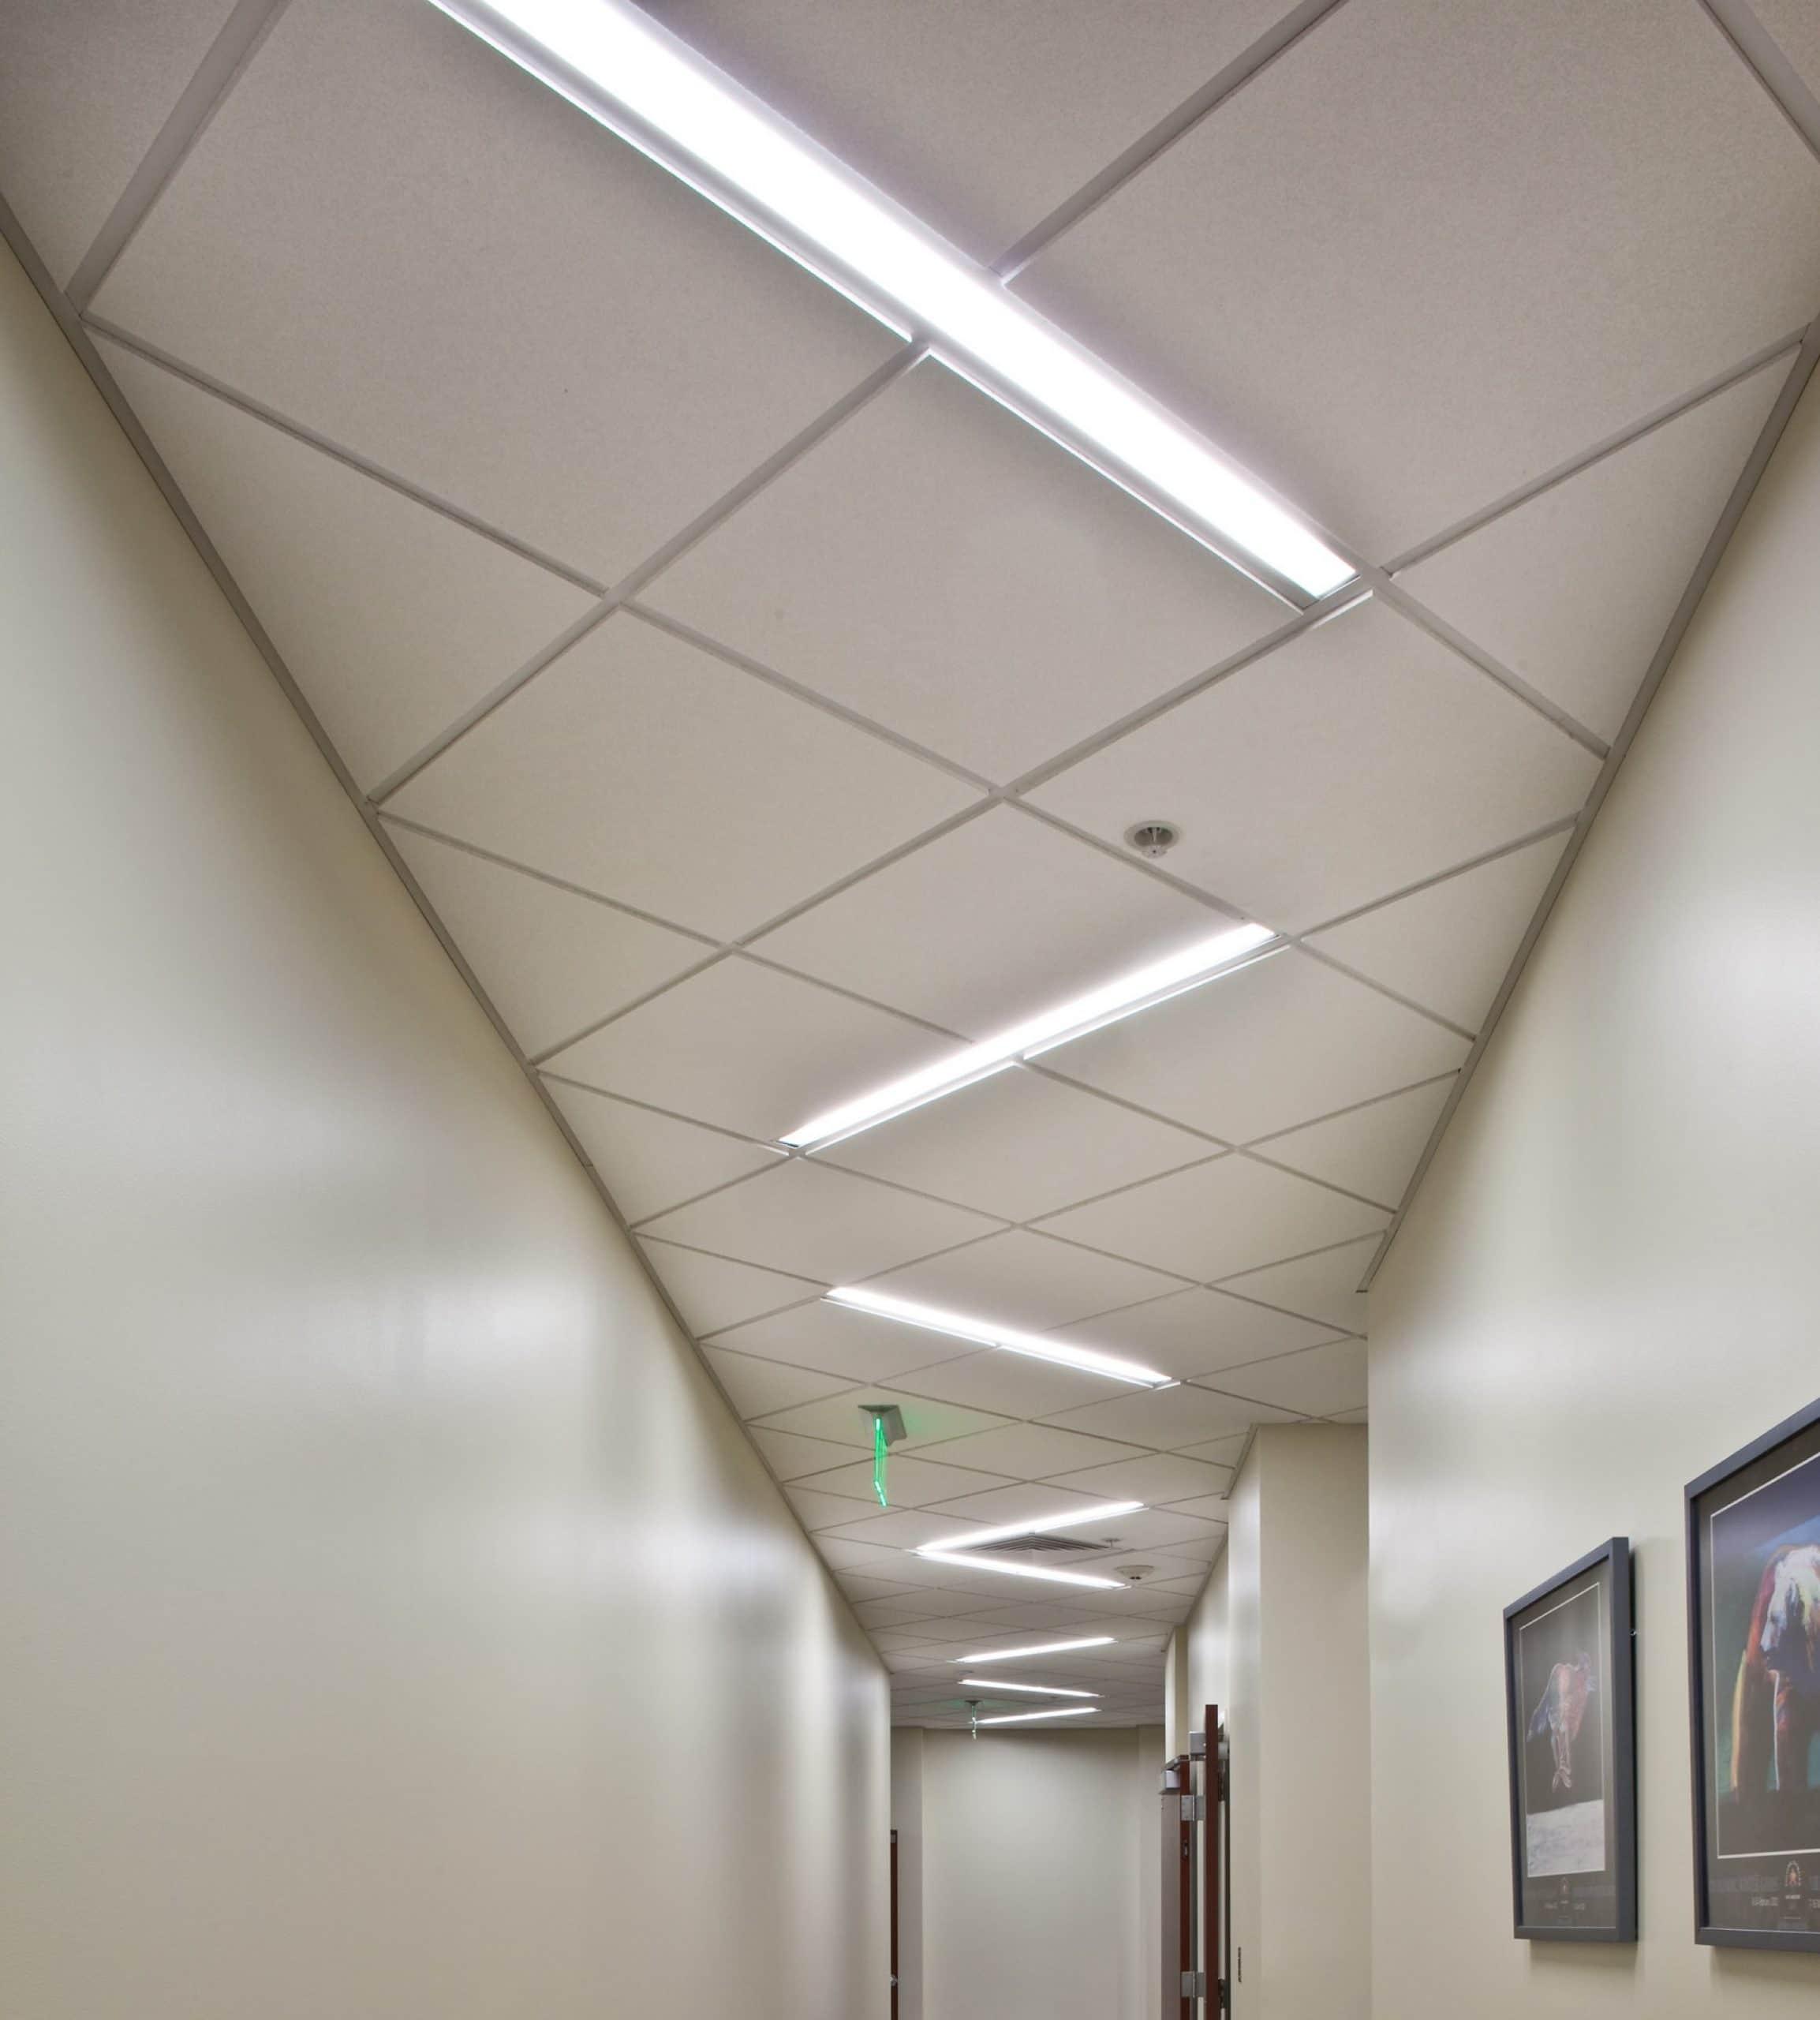 Hallway in Zions Bank Financial Center, architectural design by Elliott Workgroup